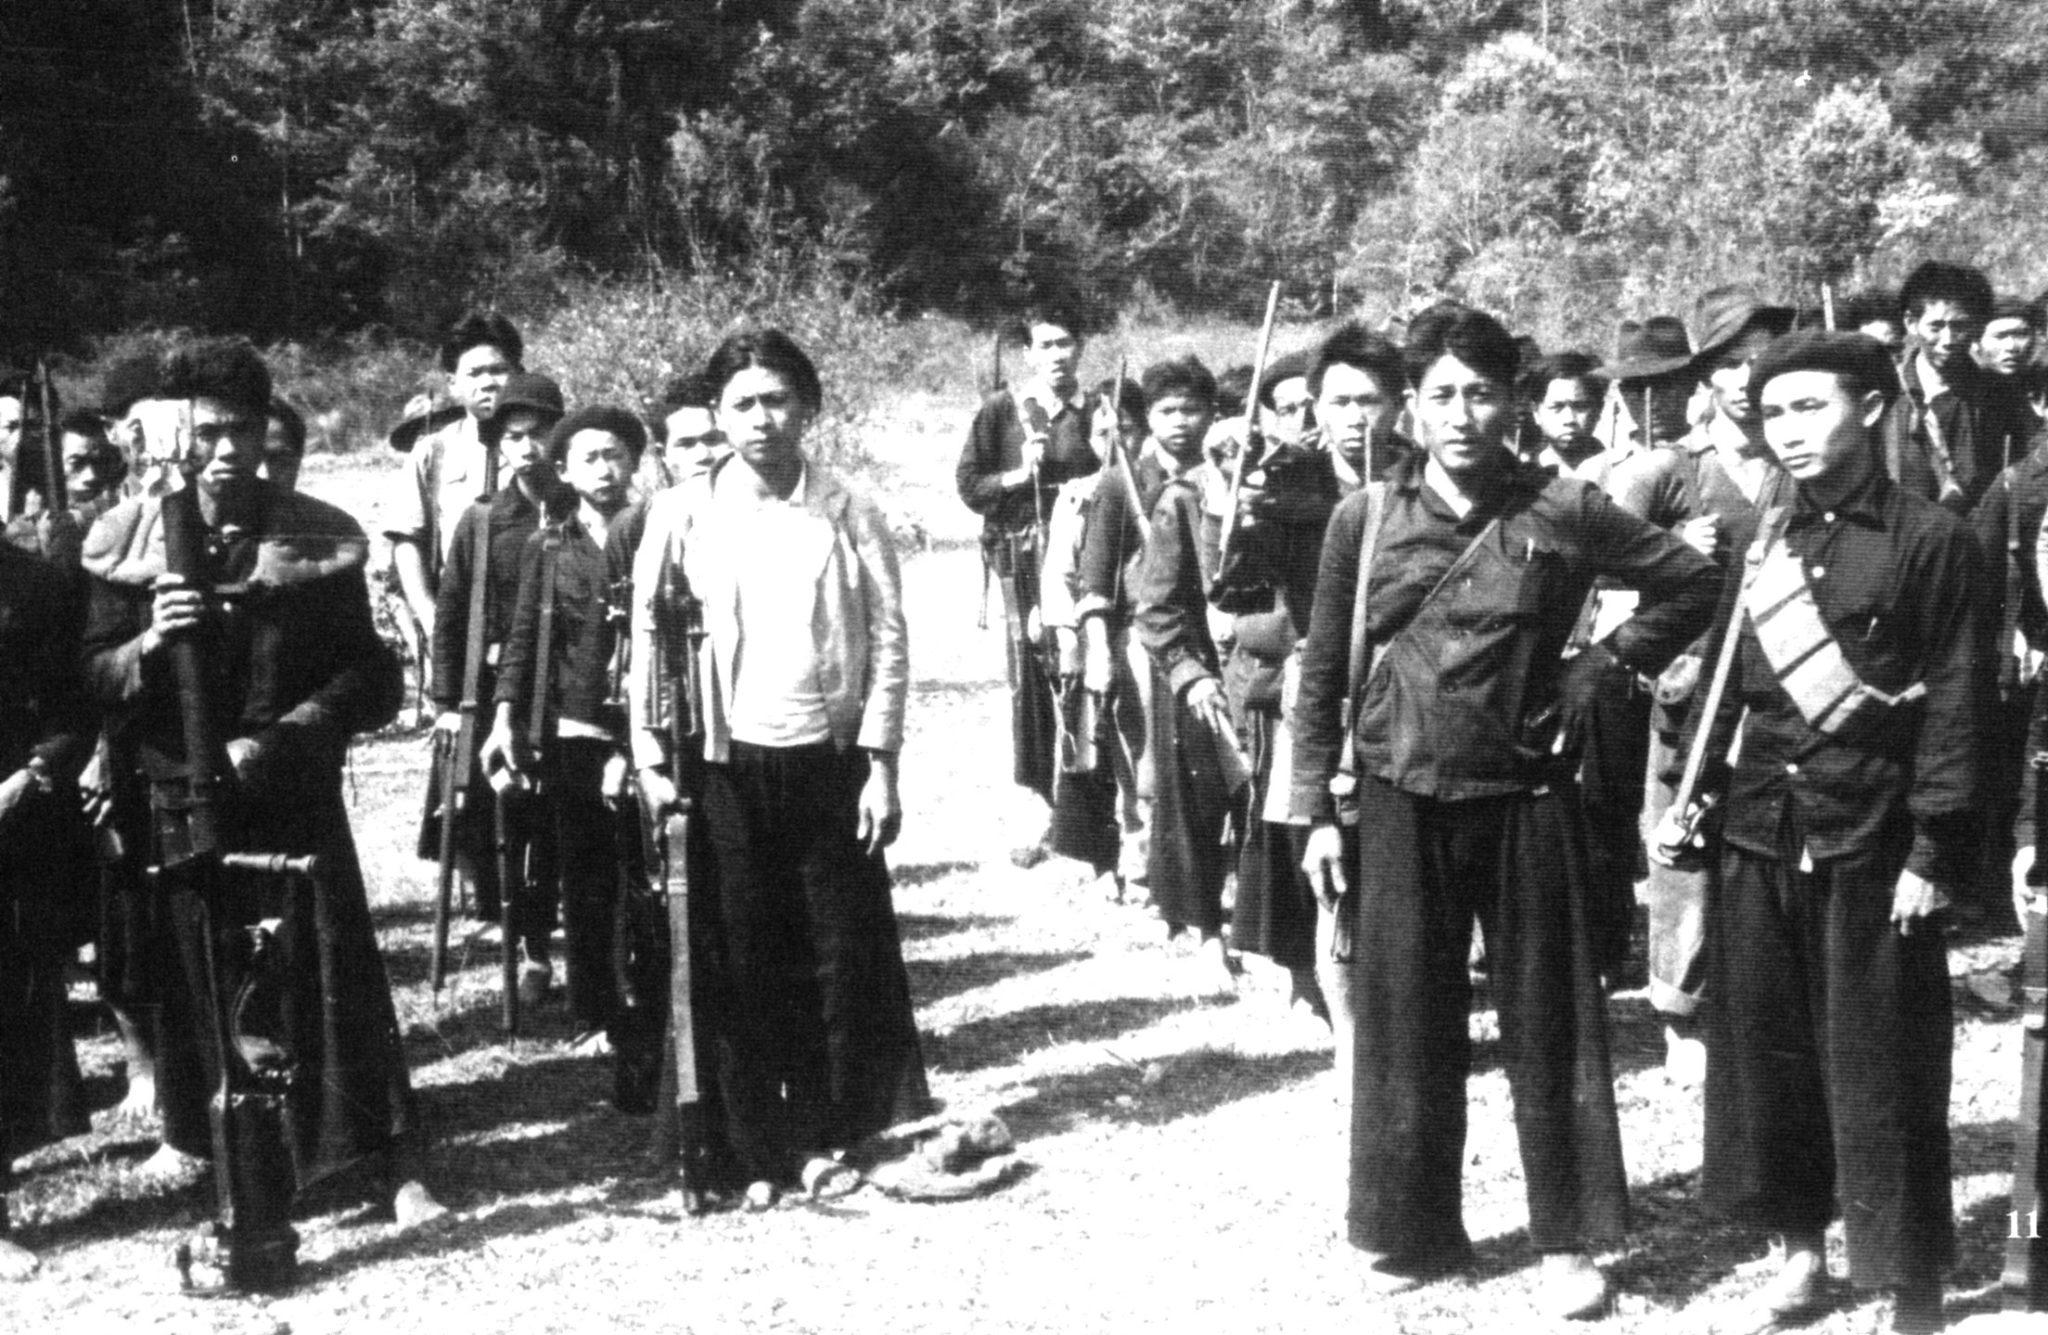 Troupes de guérilla Anti-communistes Hmong en 1961.